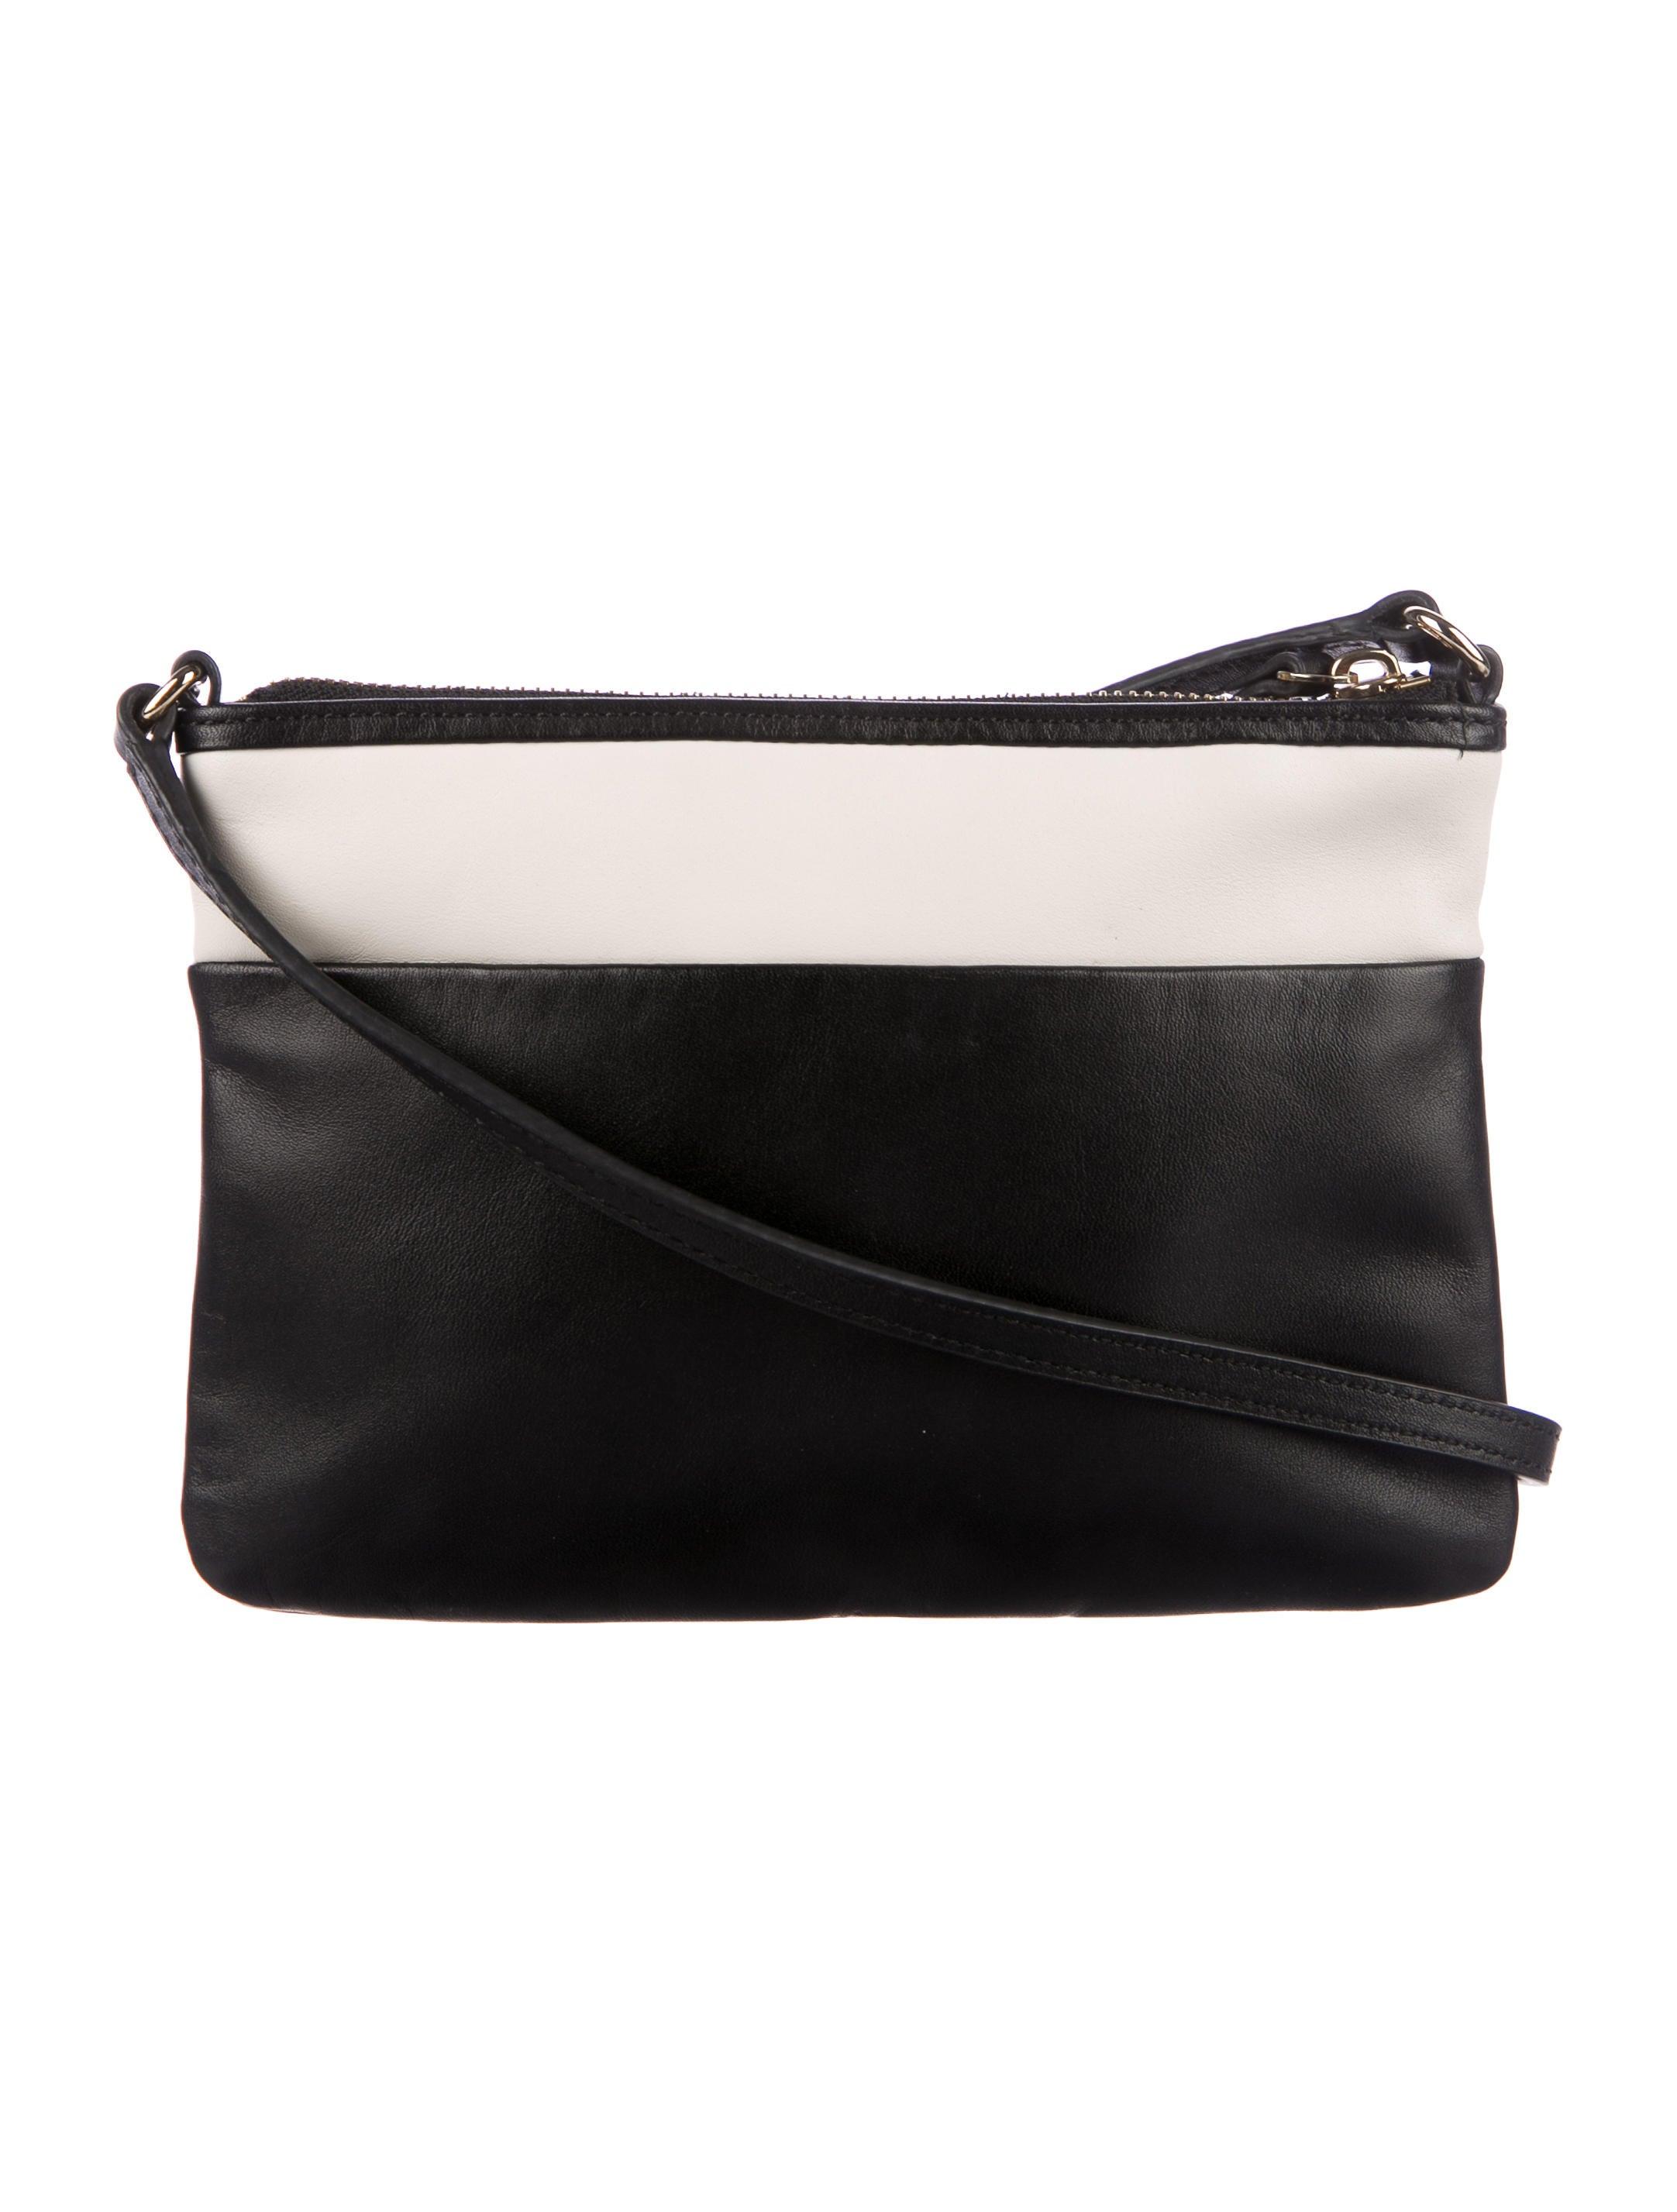 Kate Spade New York Leather Crossbody Bag Handbags  : WKA680424enlarged from www.therealreal.com size 2164 x 2855 jpeg 264kB